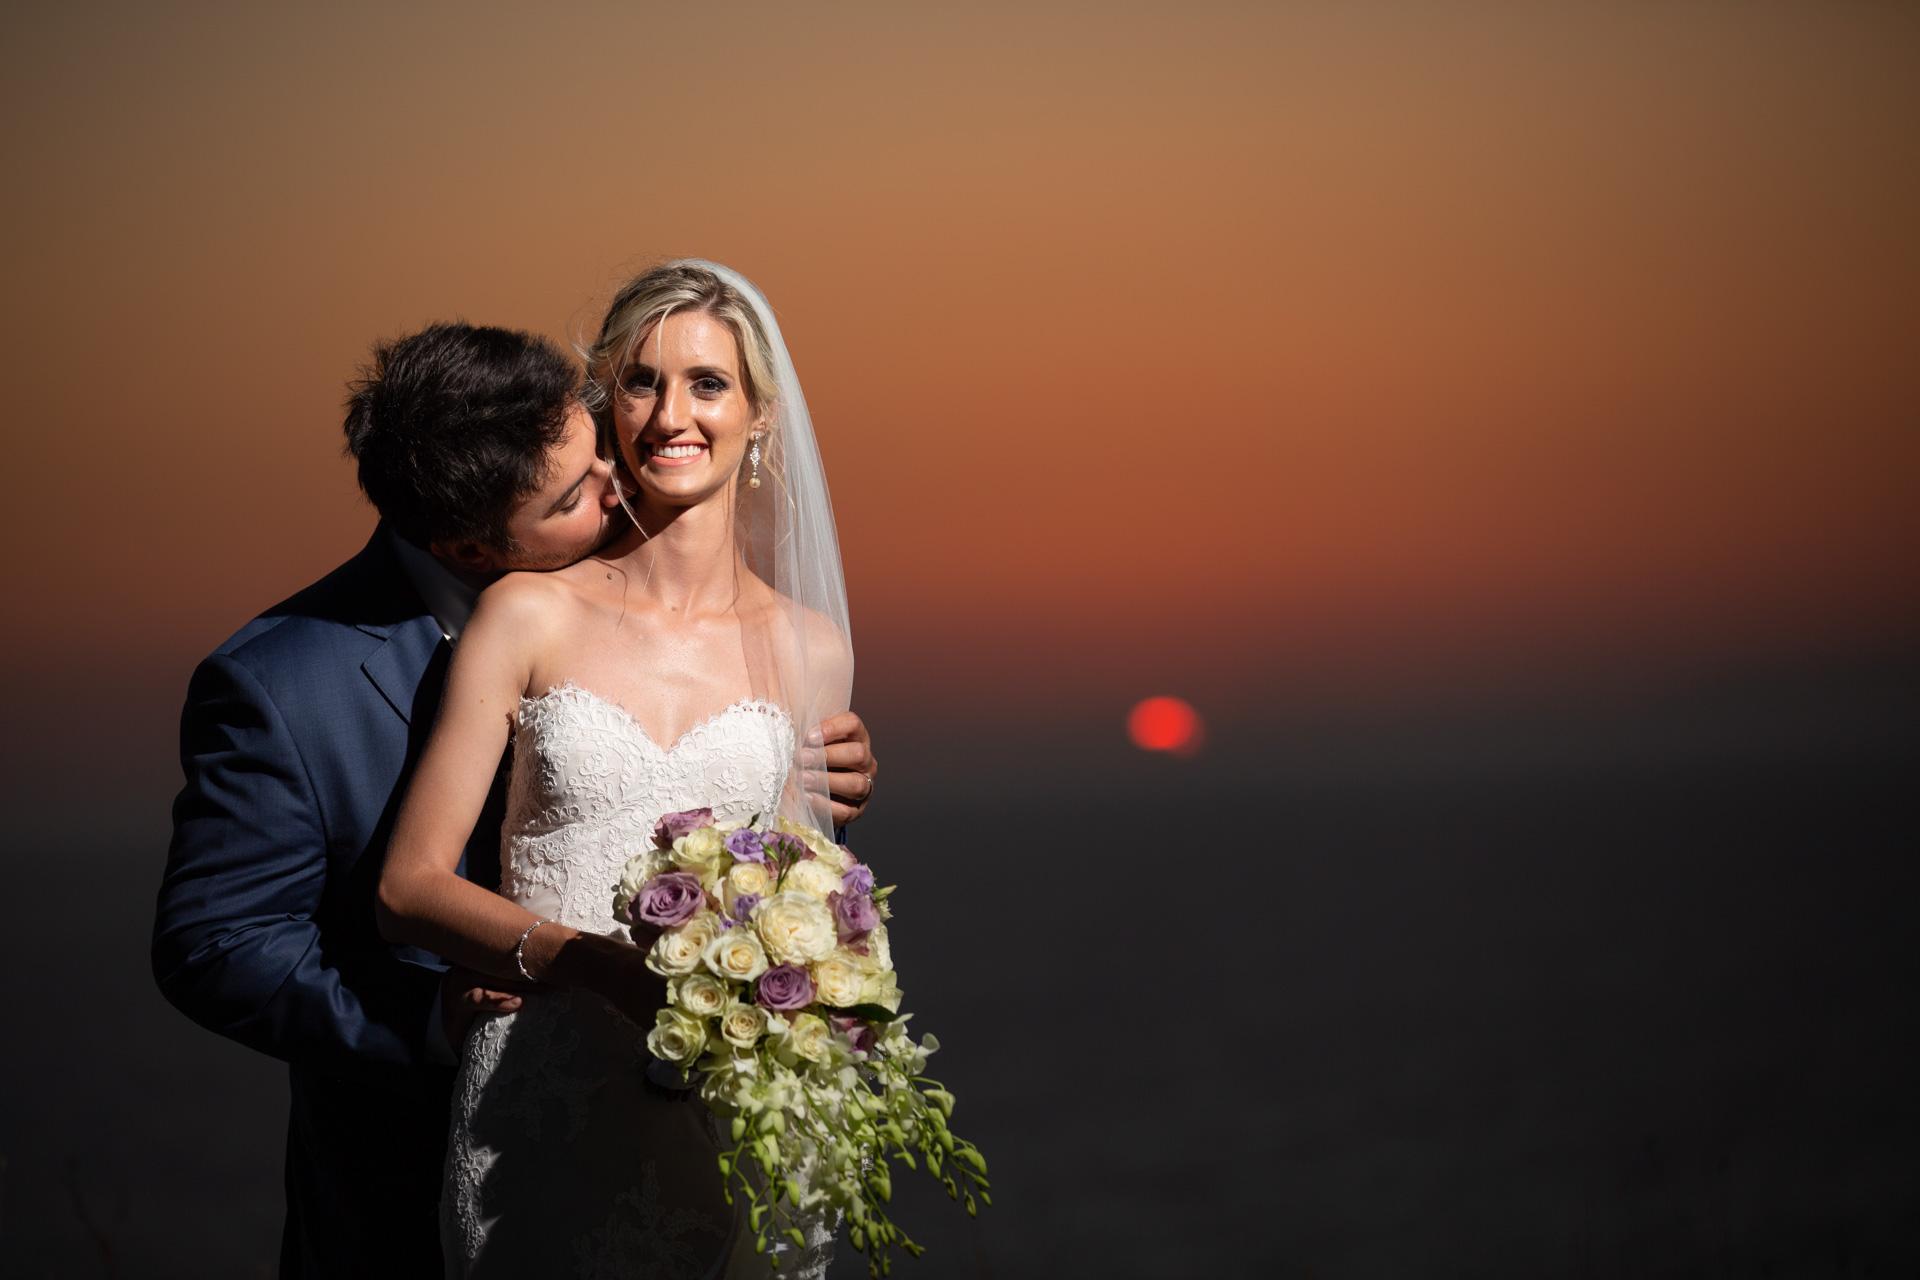 Fotografoi Sparti Fotografoi Spartis φωτογραφοι σπαρτη φωτογραφοι σπαρτης,αλεξανδρακης δημητρης Alexandrakis Alexandrakis Photography (45)